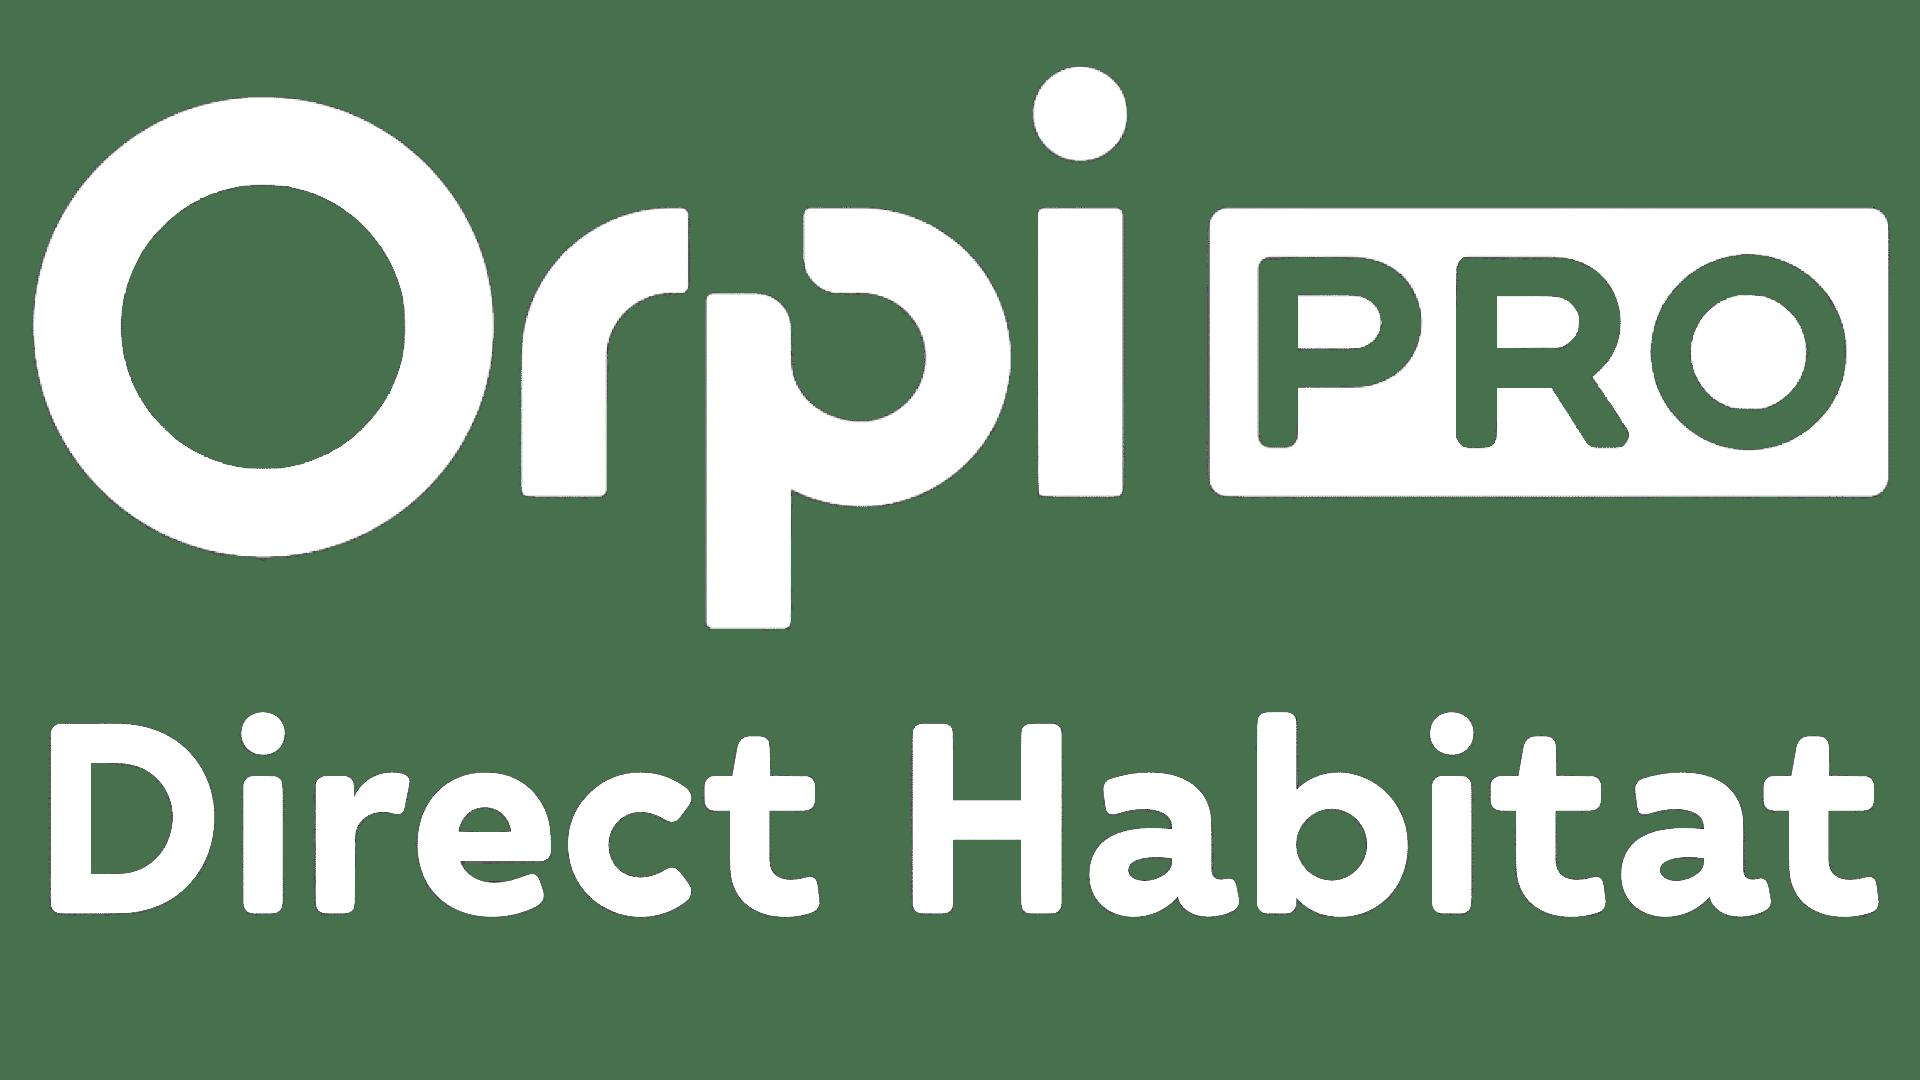 ORPI Pro By Direct Habitat